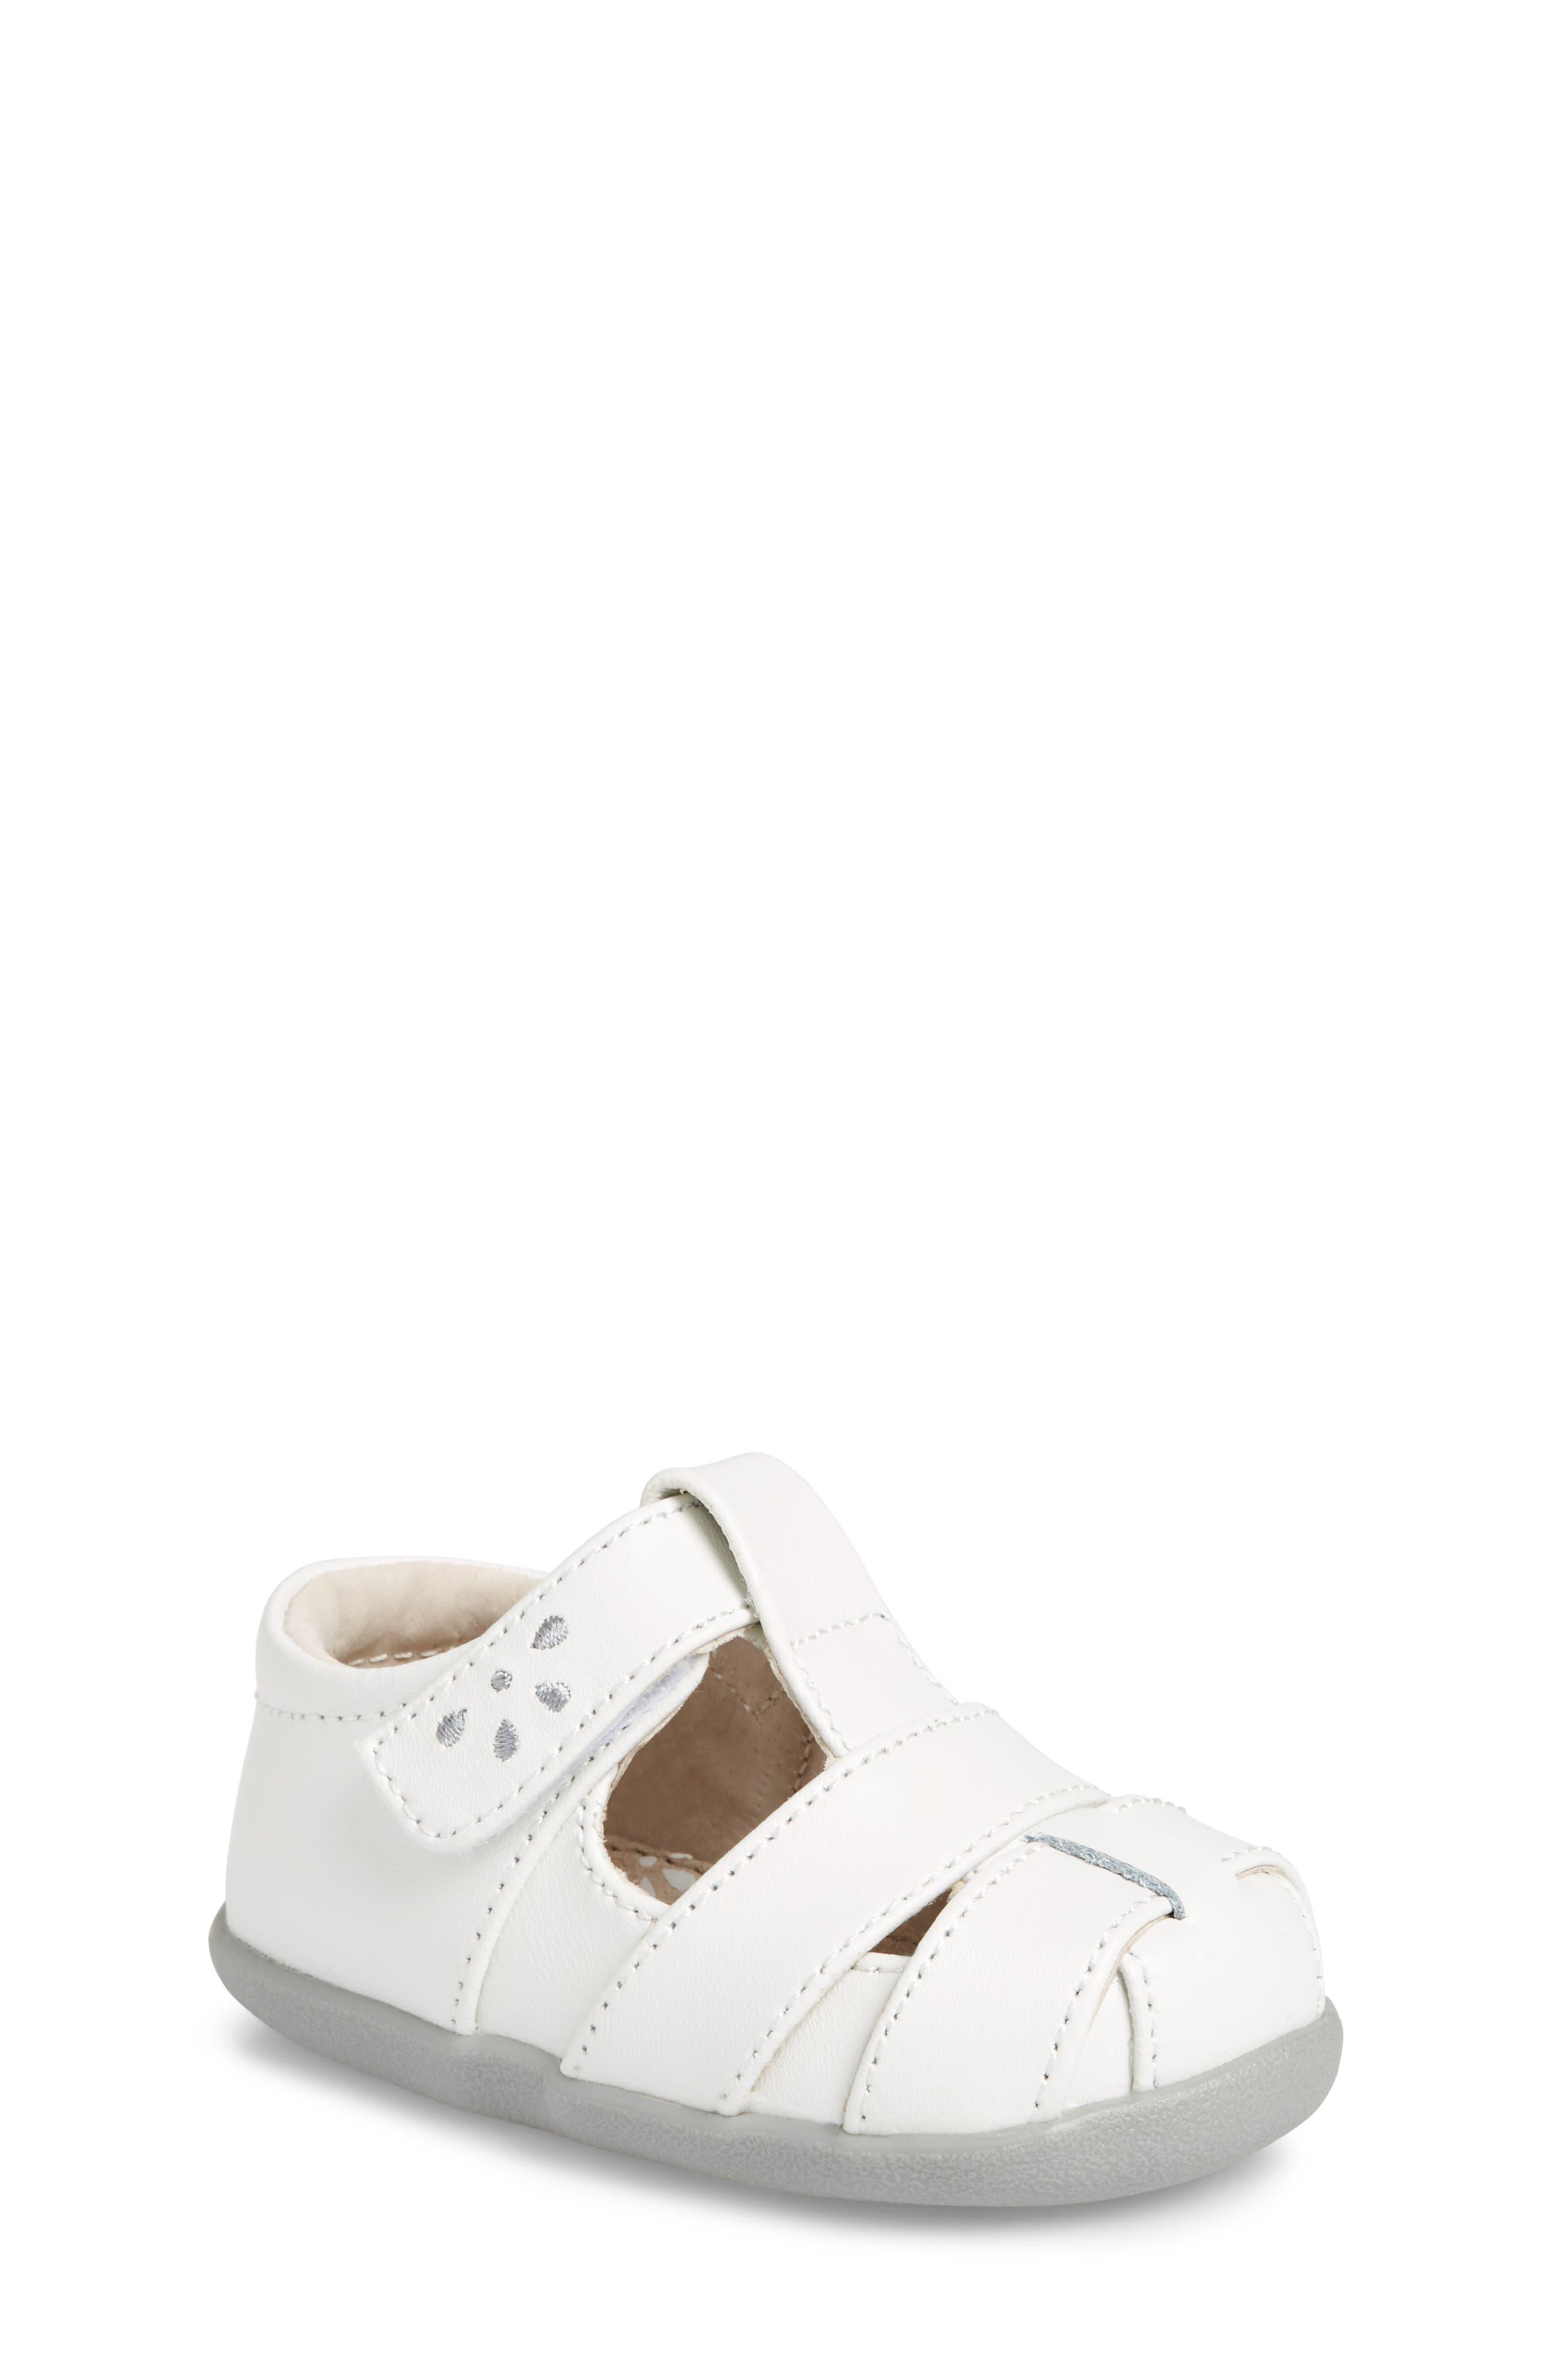 Brook III Sandal,                         Main,                         color, White